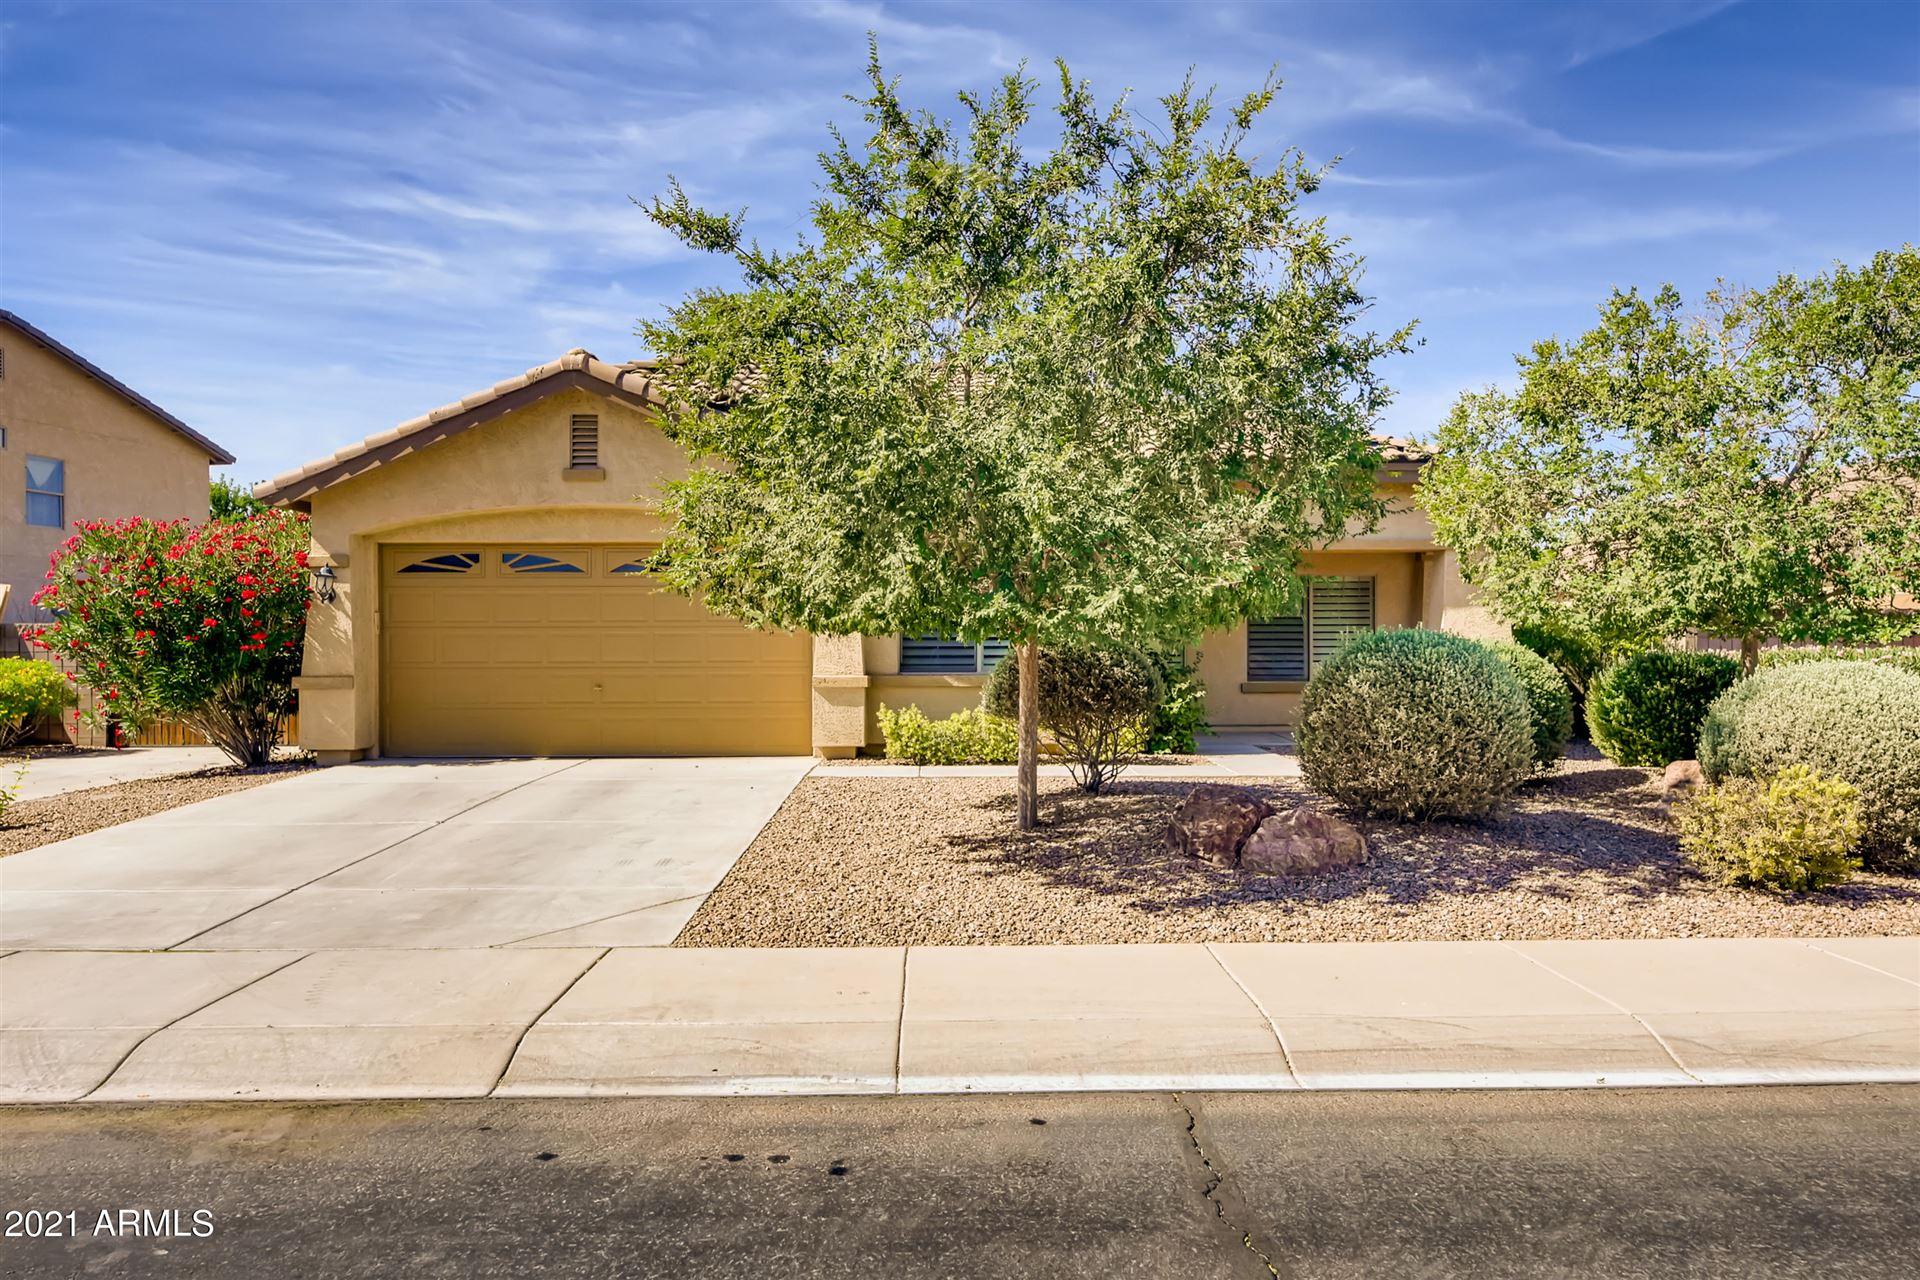 Photo for 44545 W VINEYARD Street, Maricopa, AZ 85139 (MLS # 6247940)